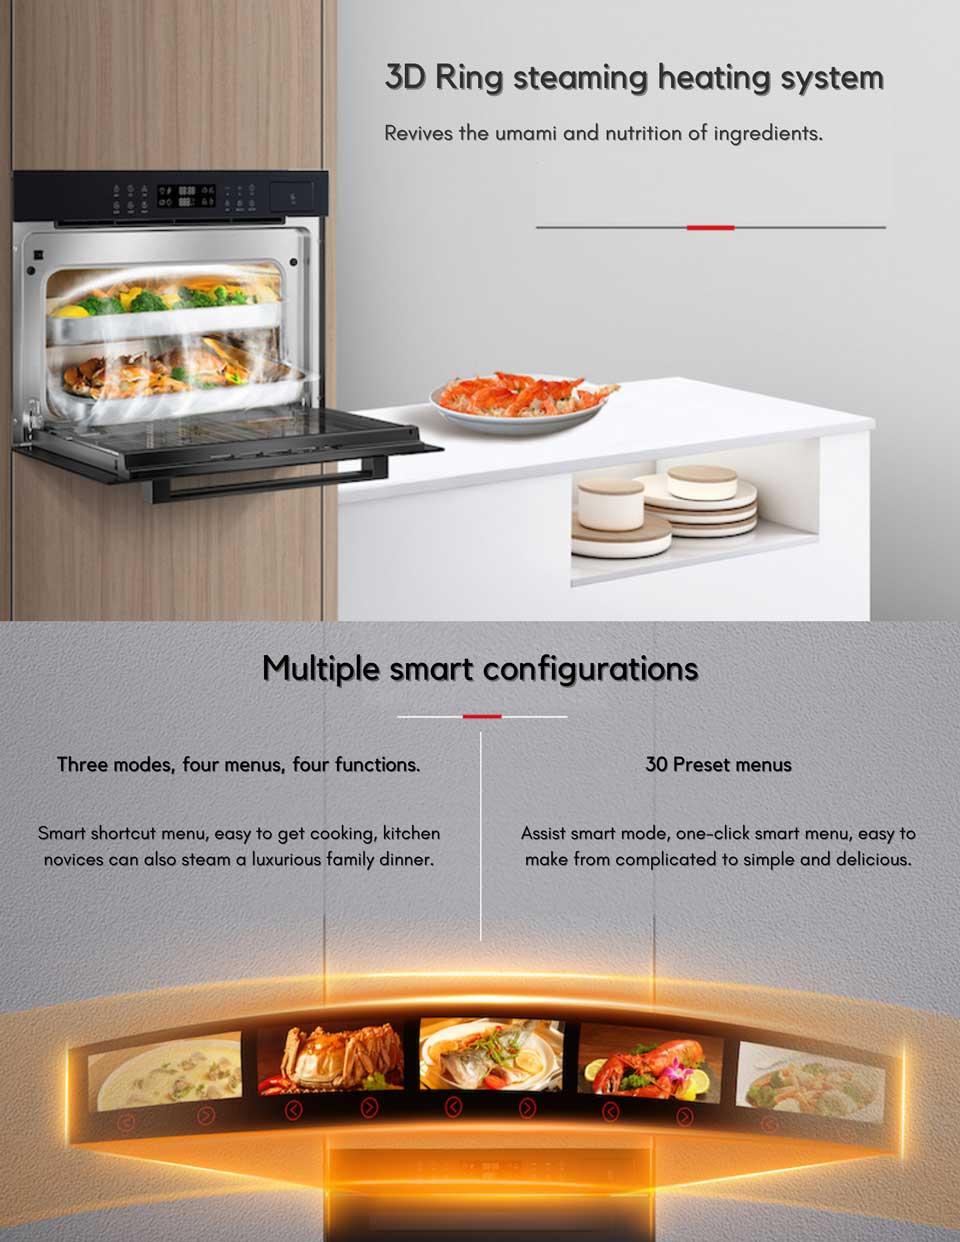 Smart preset menus cooking function - DE&E ZA4565A built-in steam oven